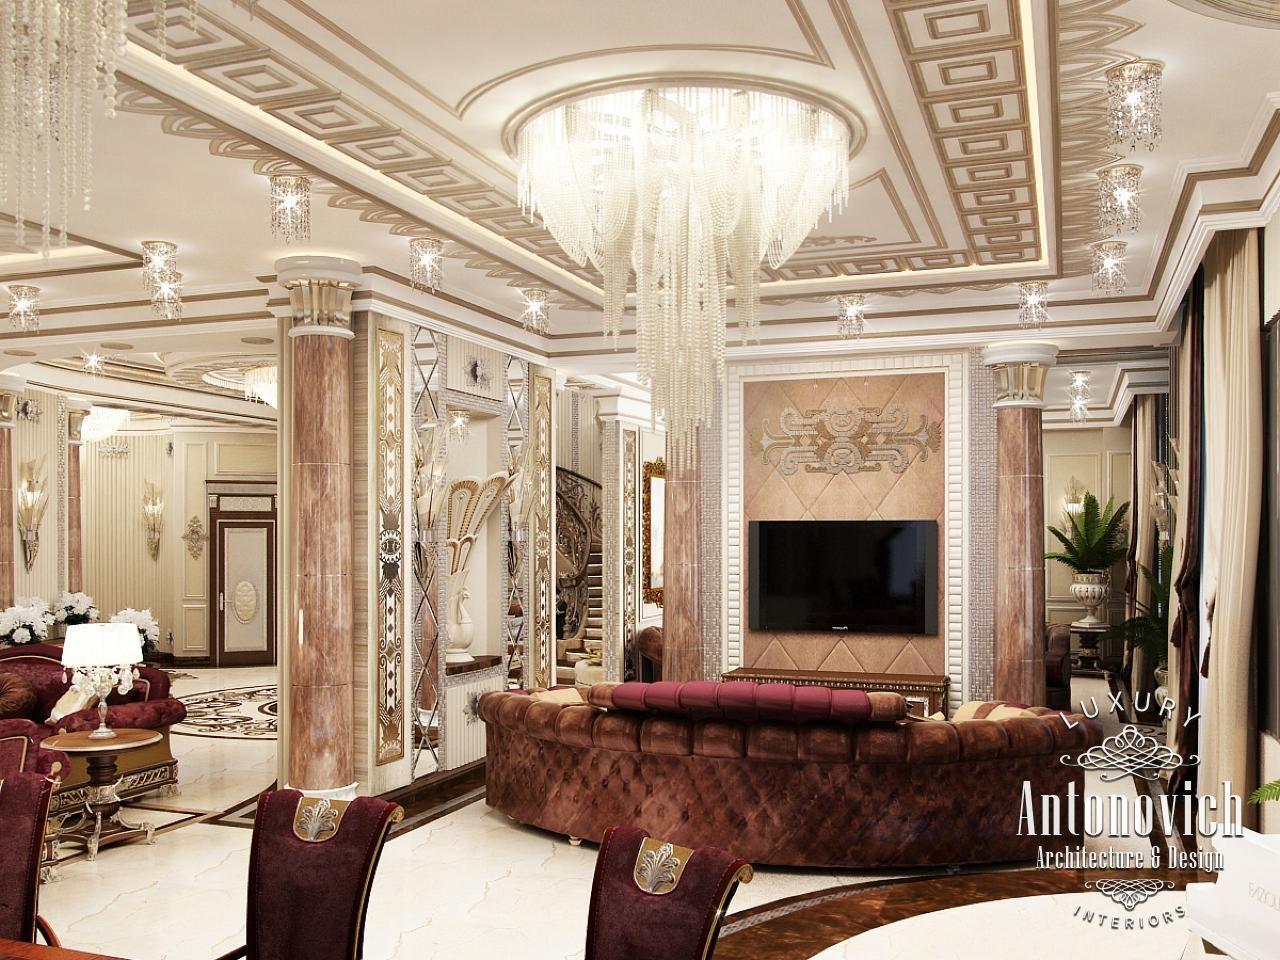 Living Room Designs In Dubai kitchen design in dubai, luxury kitchen & dining, photo 9